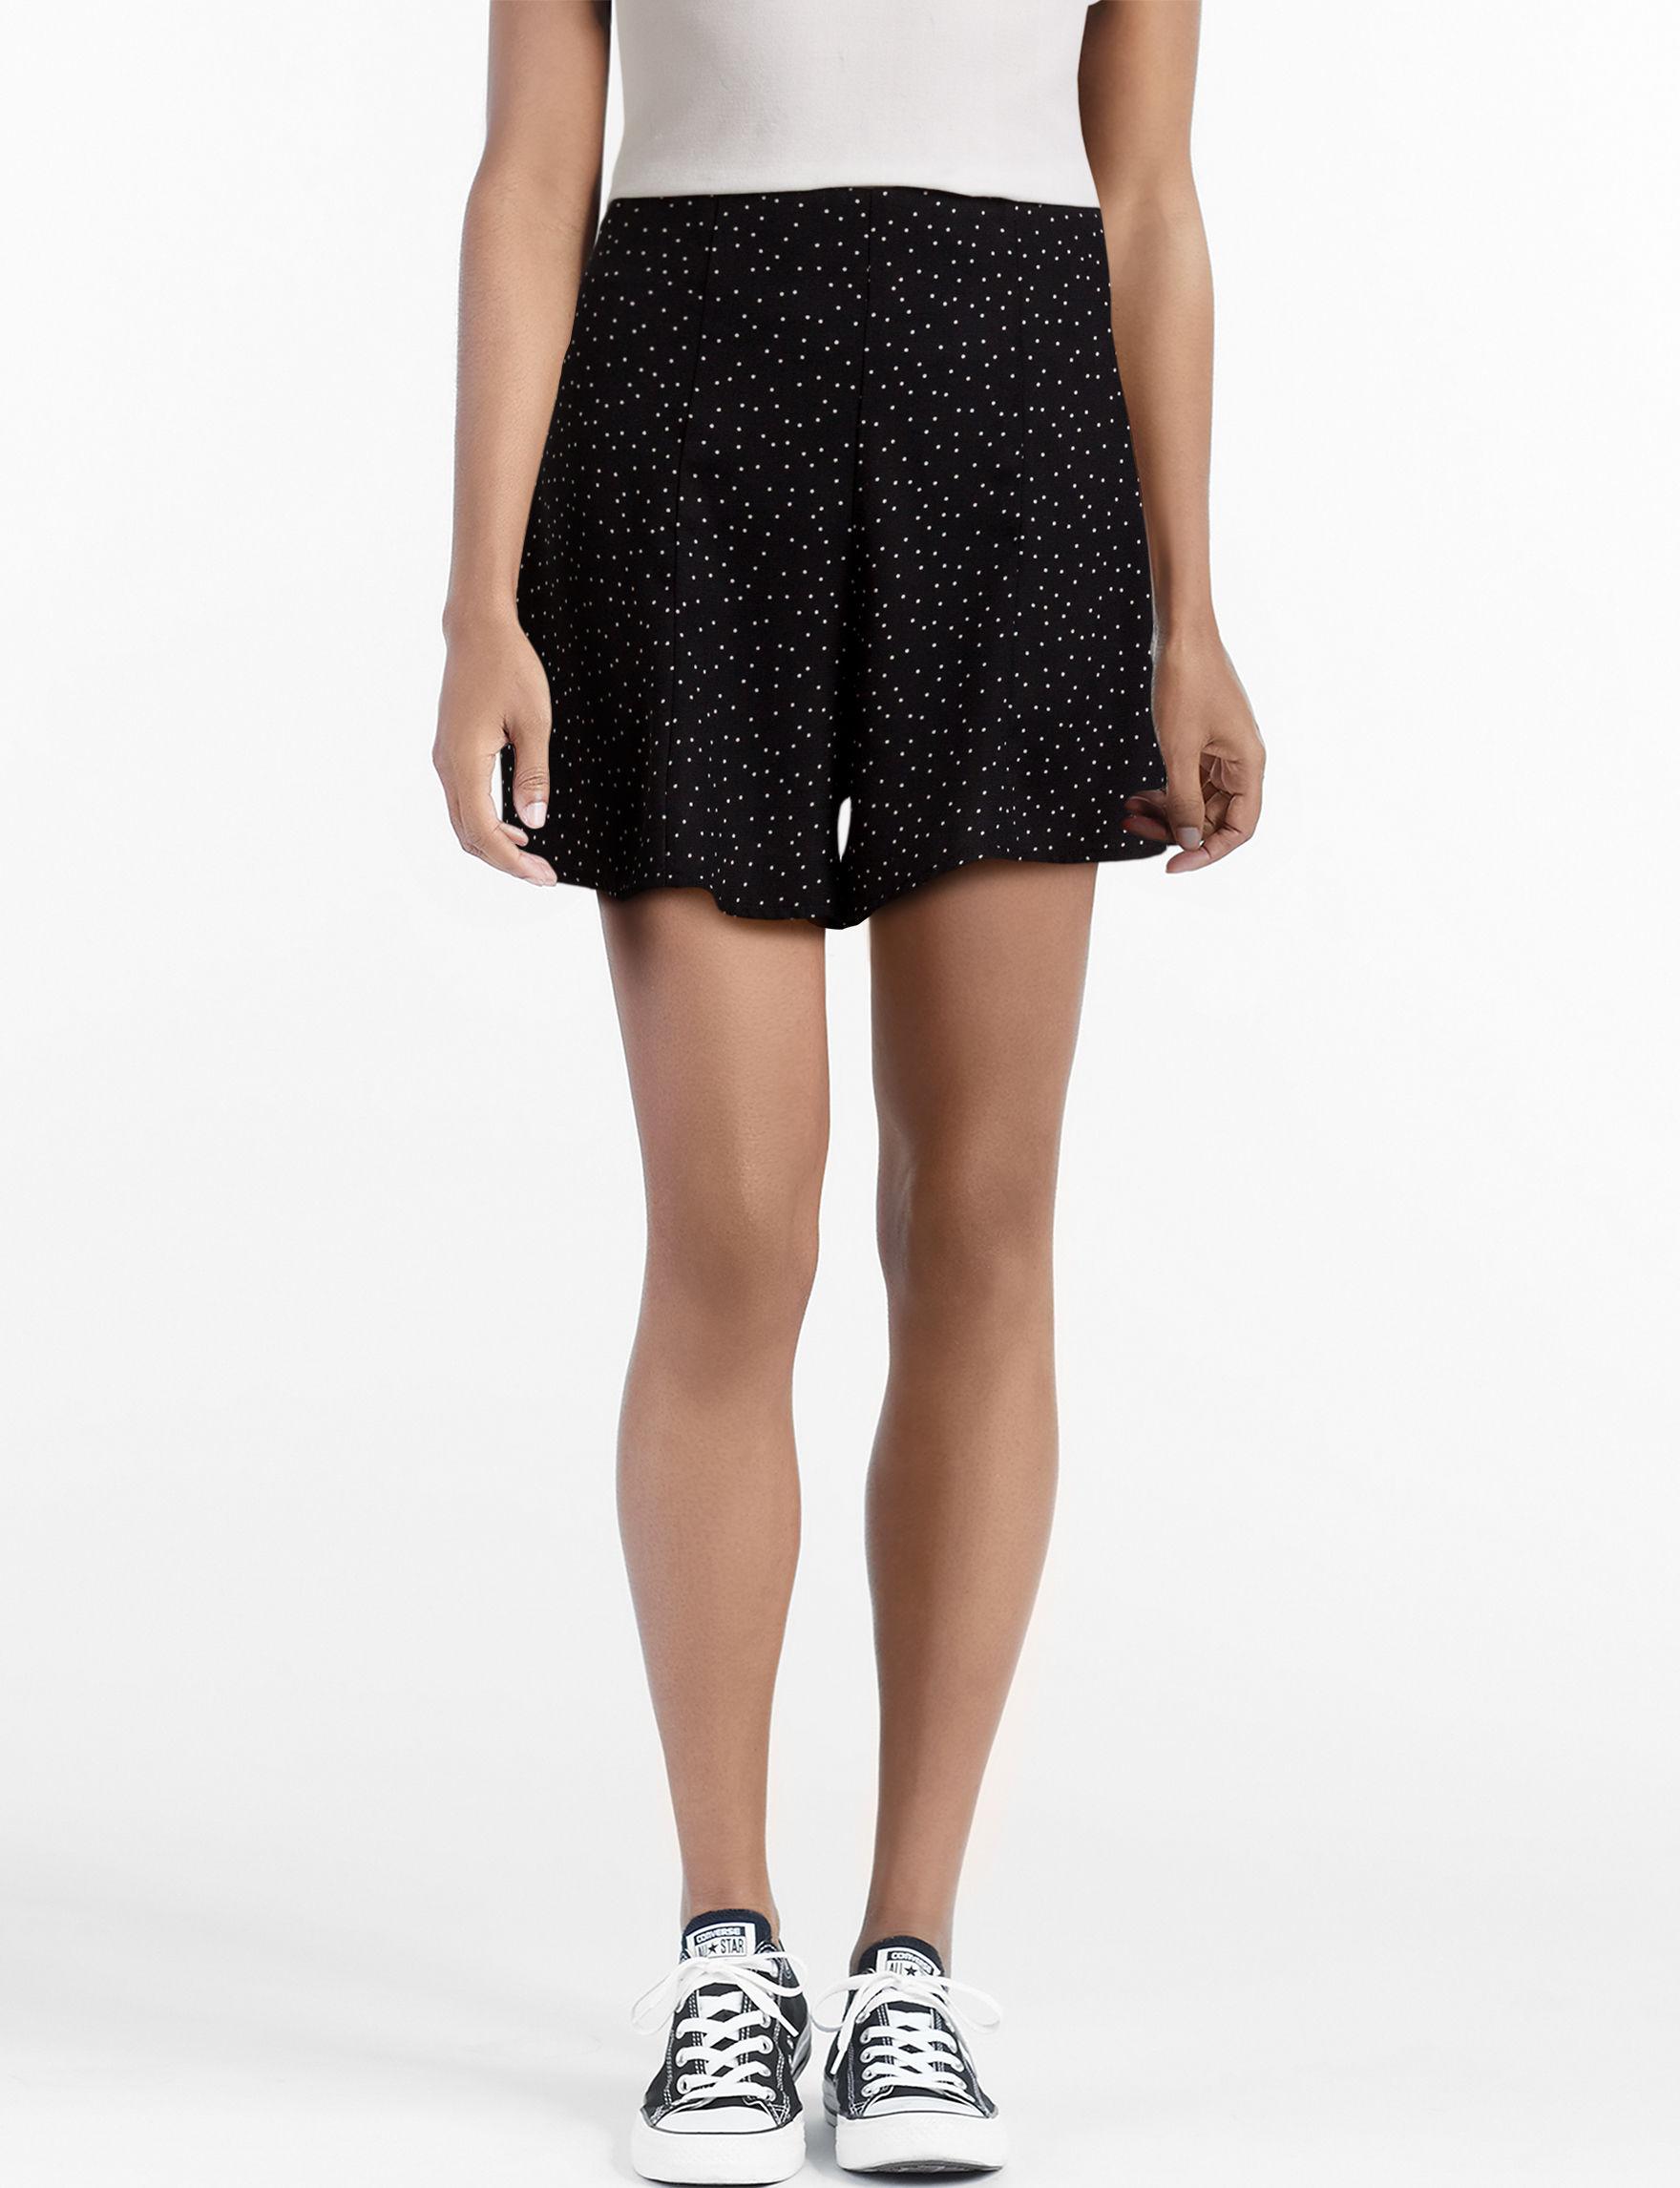 Heart Soul Black Soft Shorts